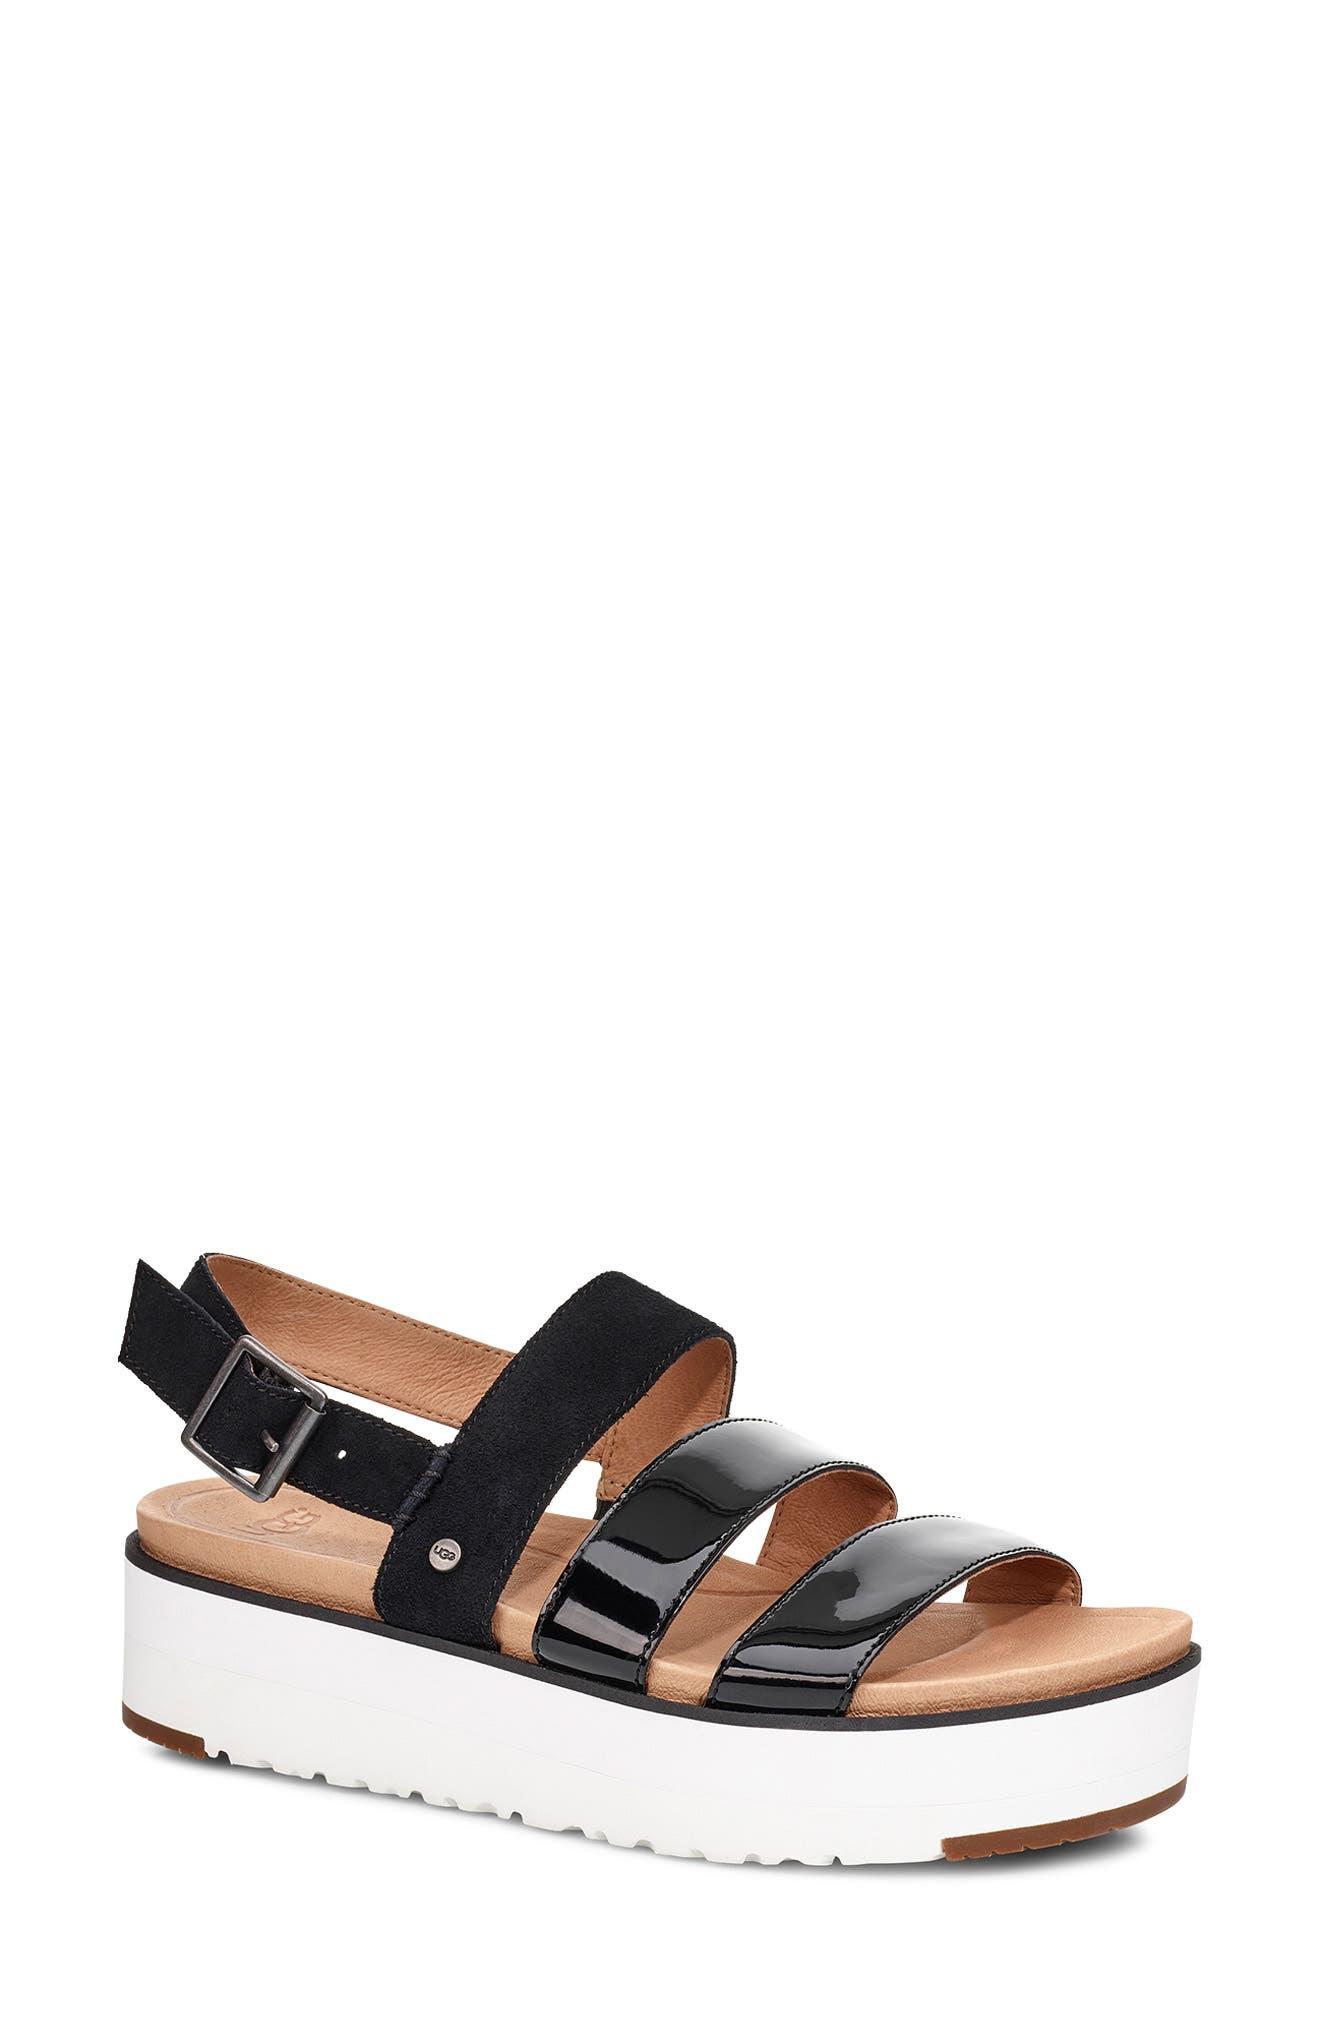 Braelynn Flatform Sandal,                             Main thumbnail 1, color,                             BLACK LEATHER